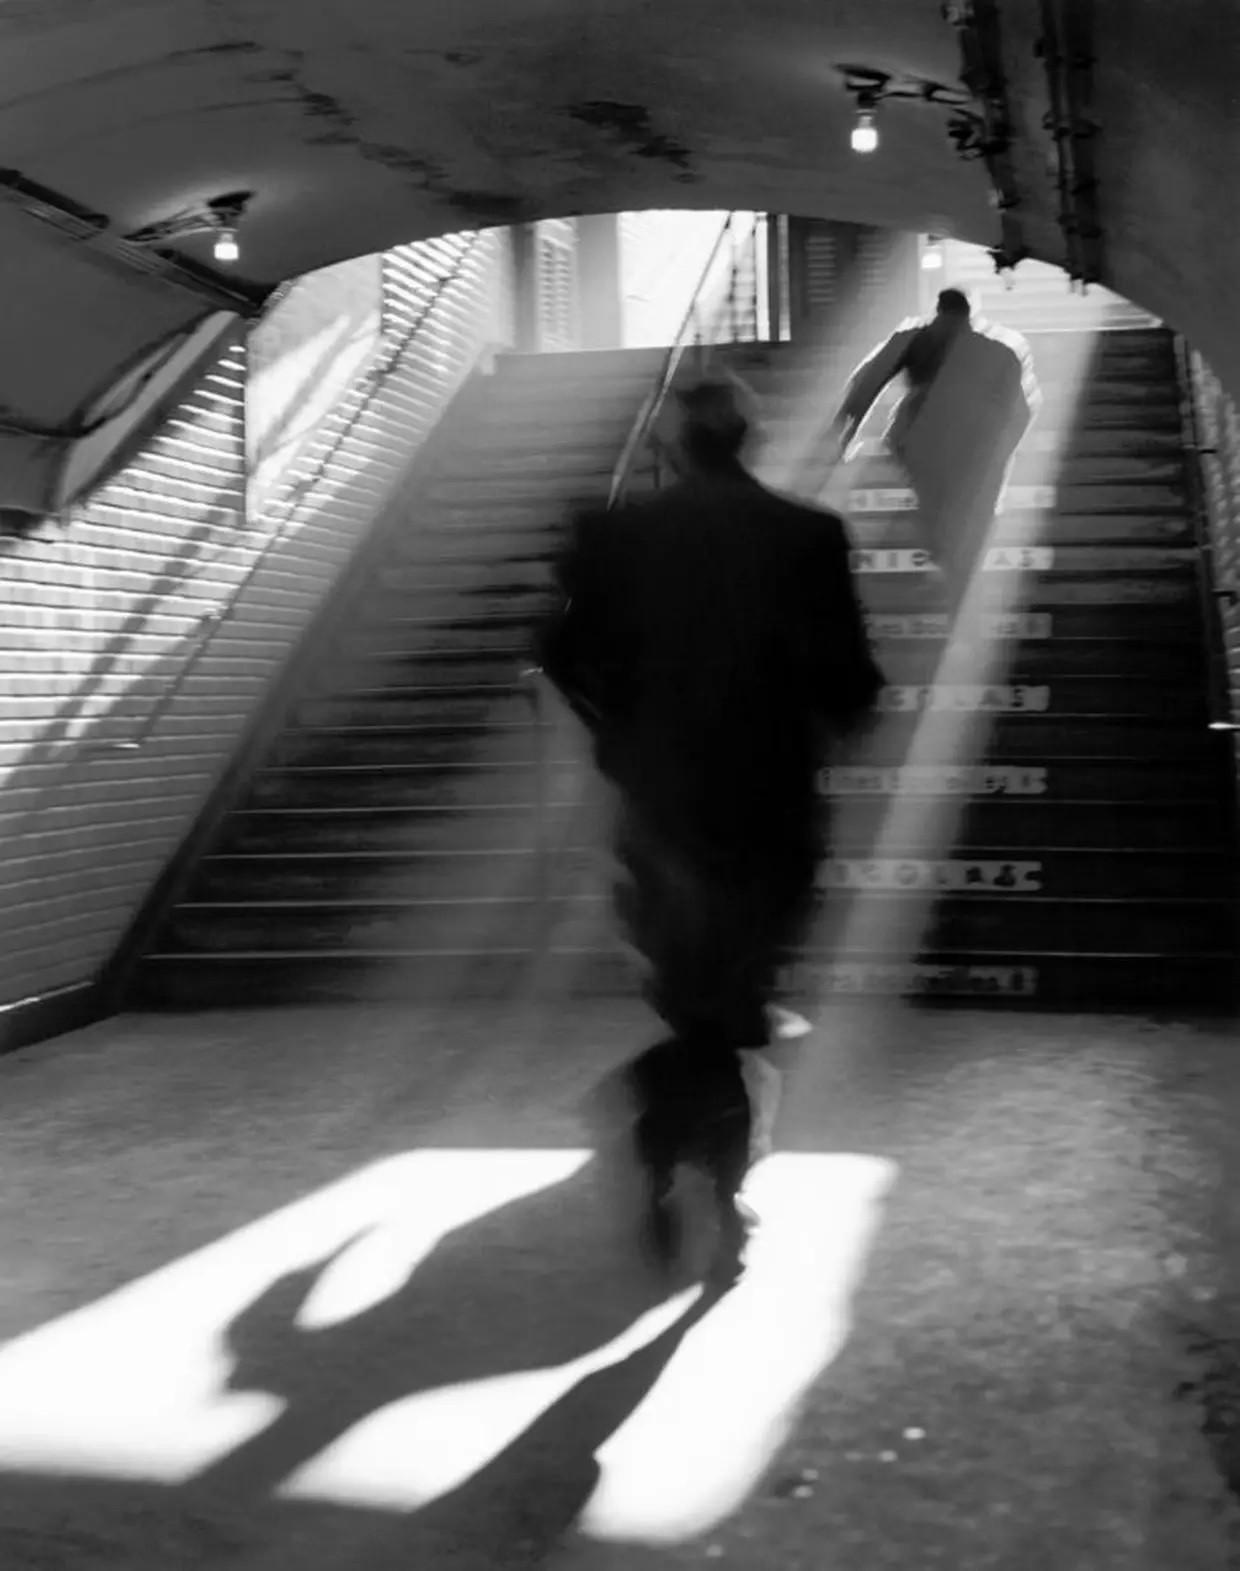 Выход из метро, Париж, 1955. Фотограф Сабина Вайс